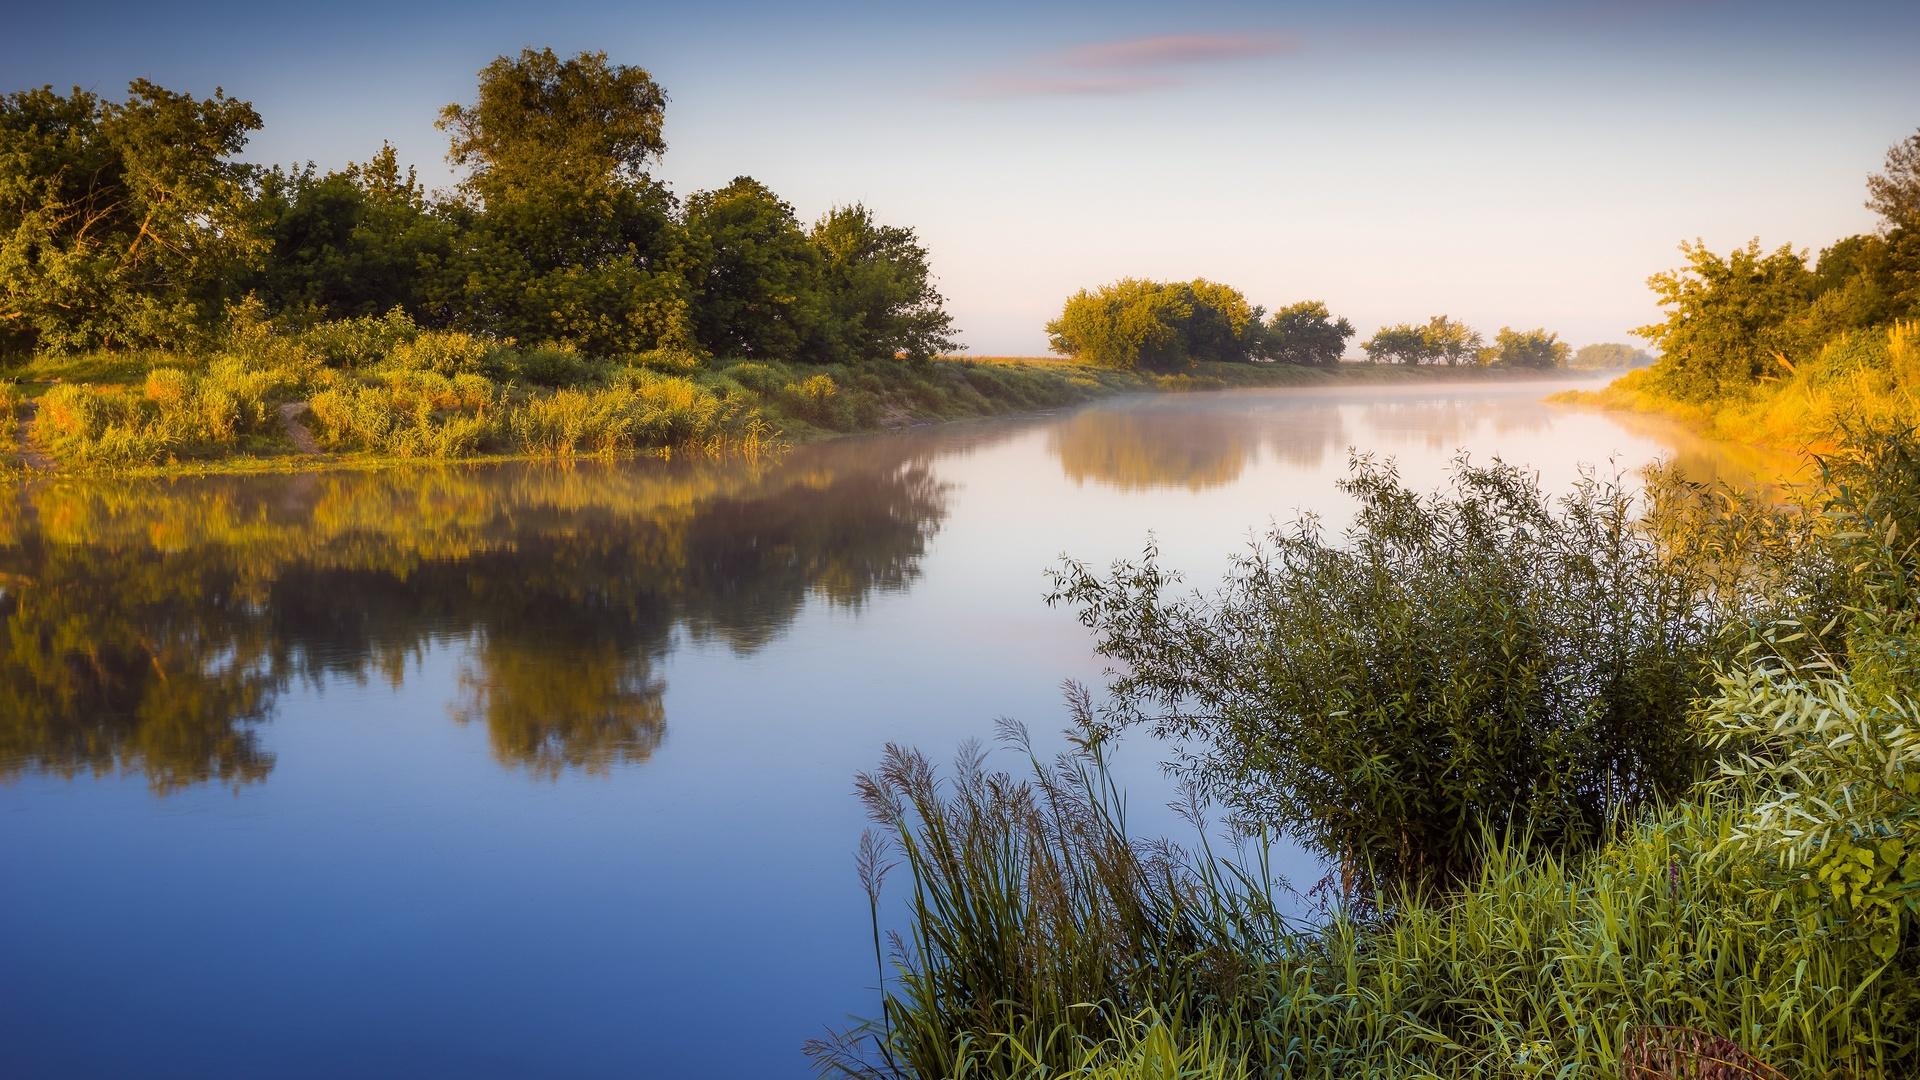 утро, кусты, трава, туман, природа